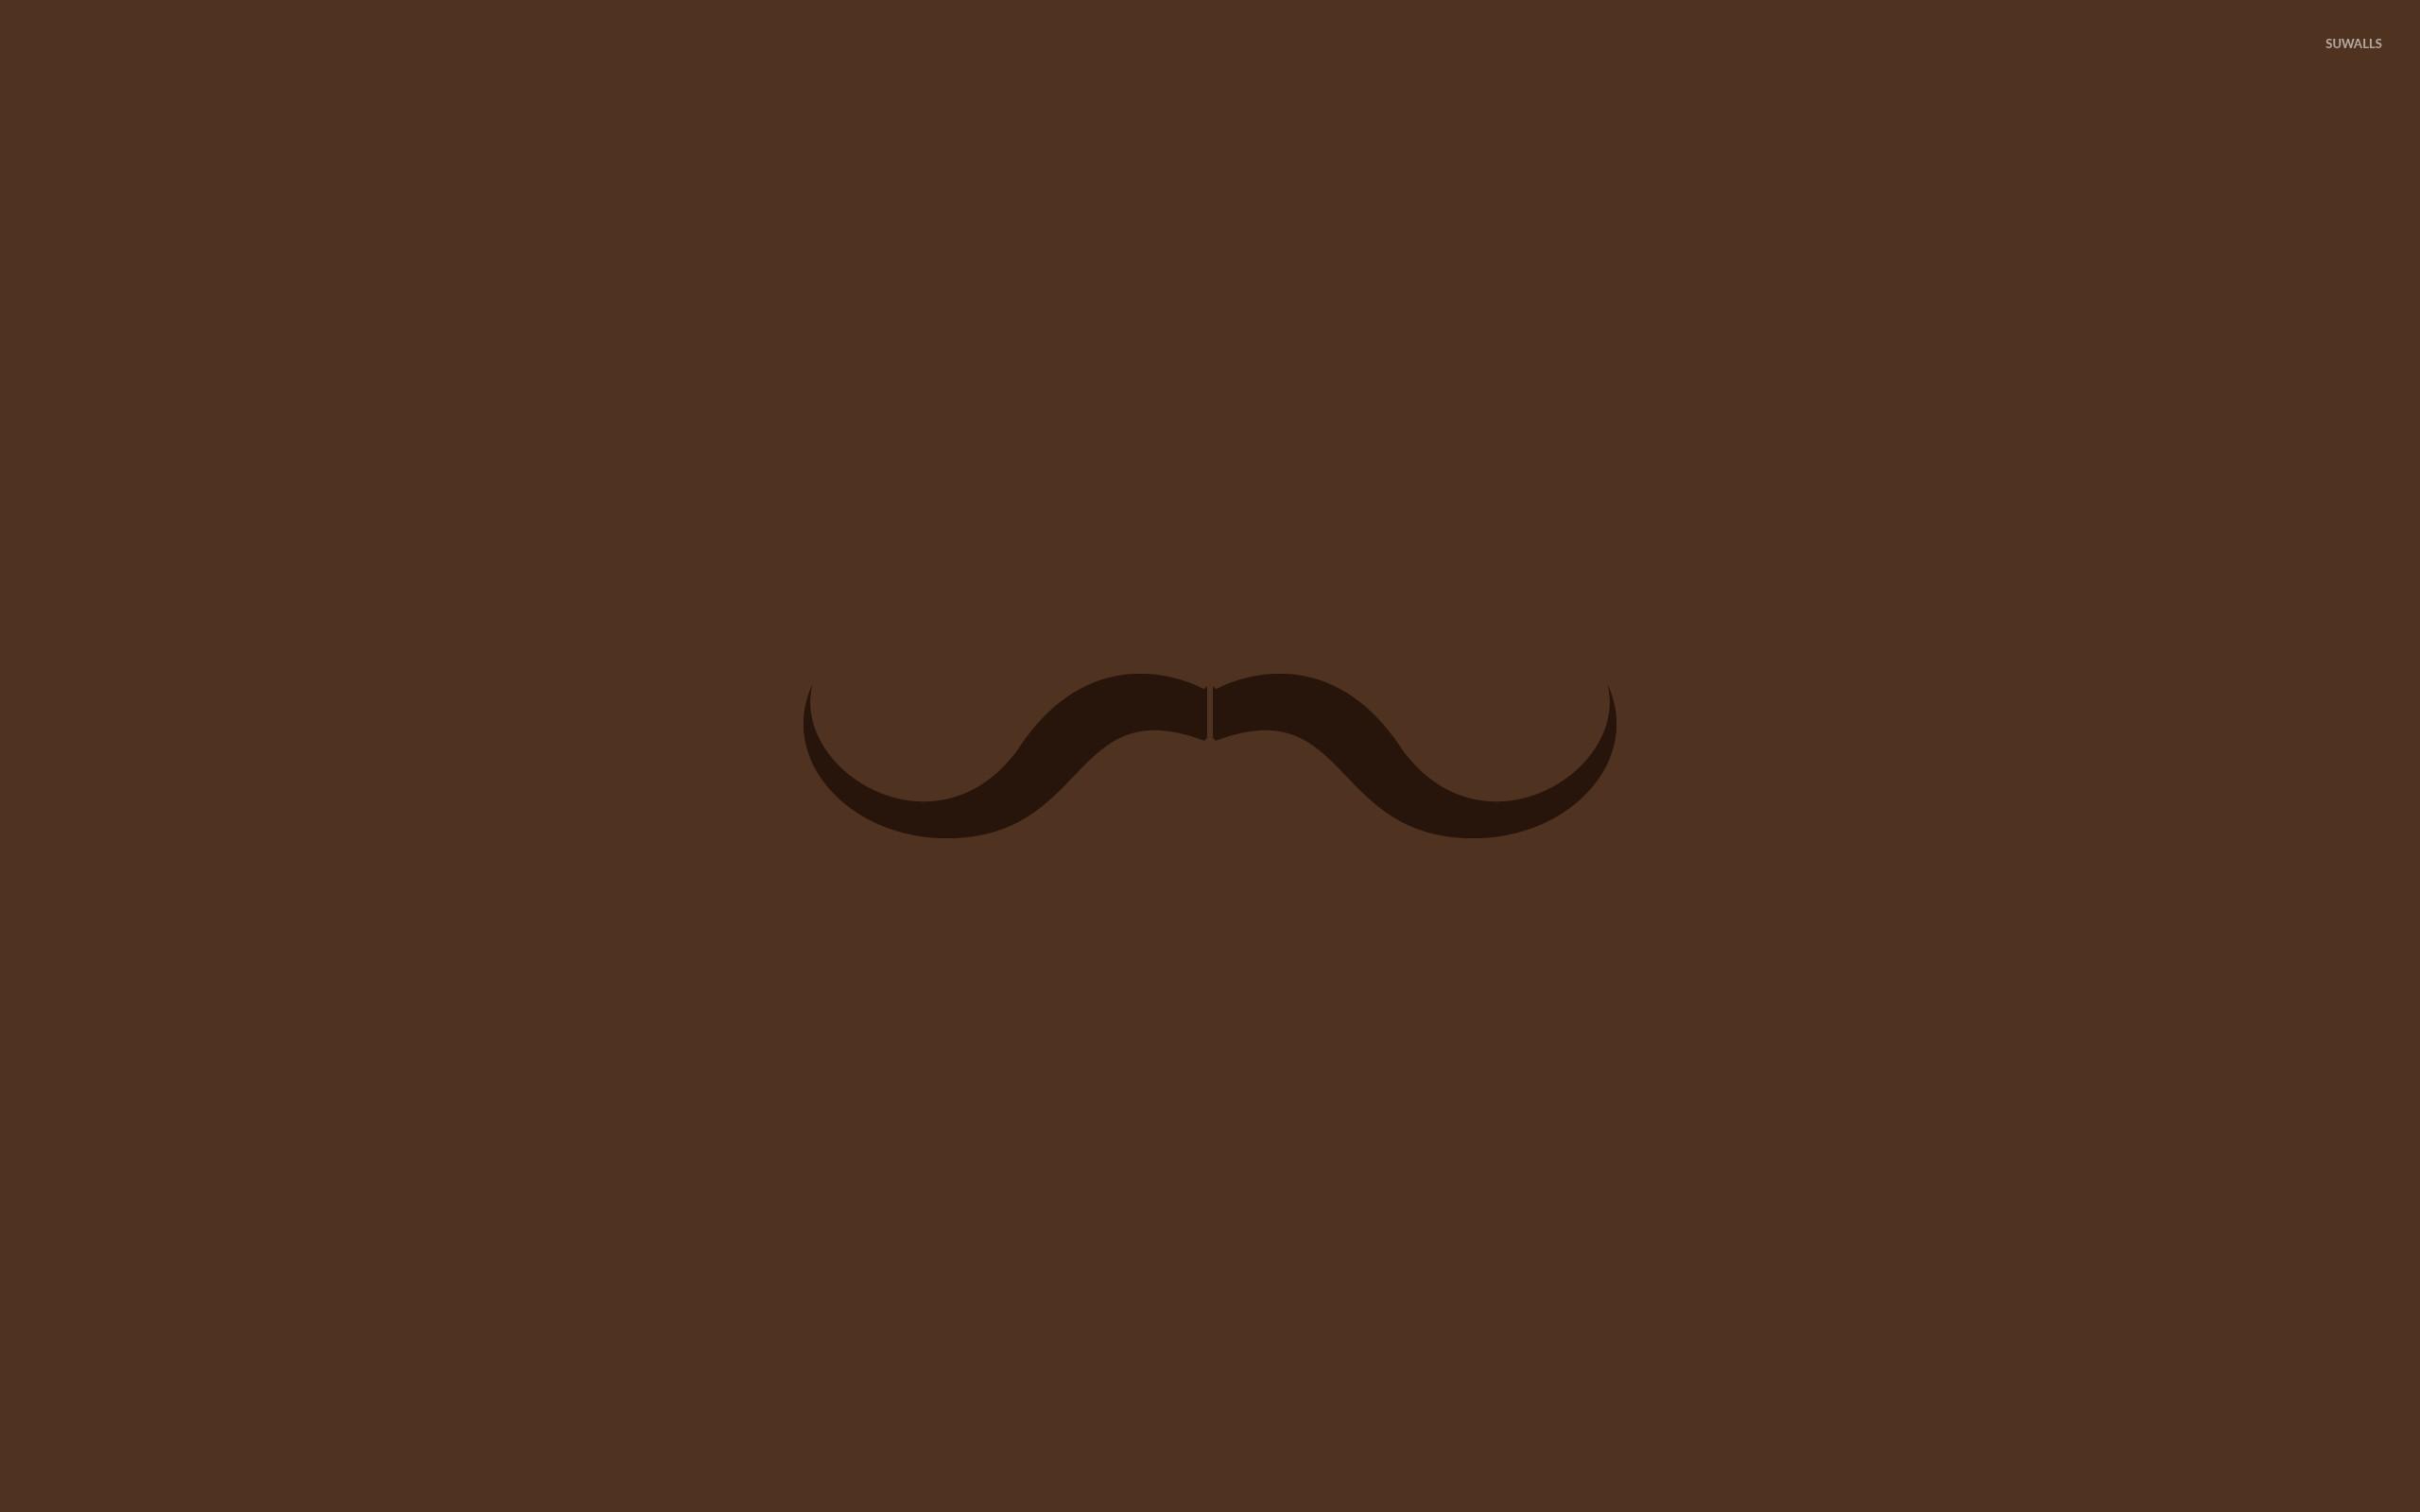 Brown moustache wallpaper